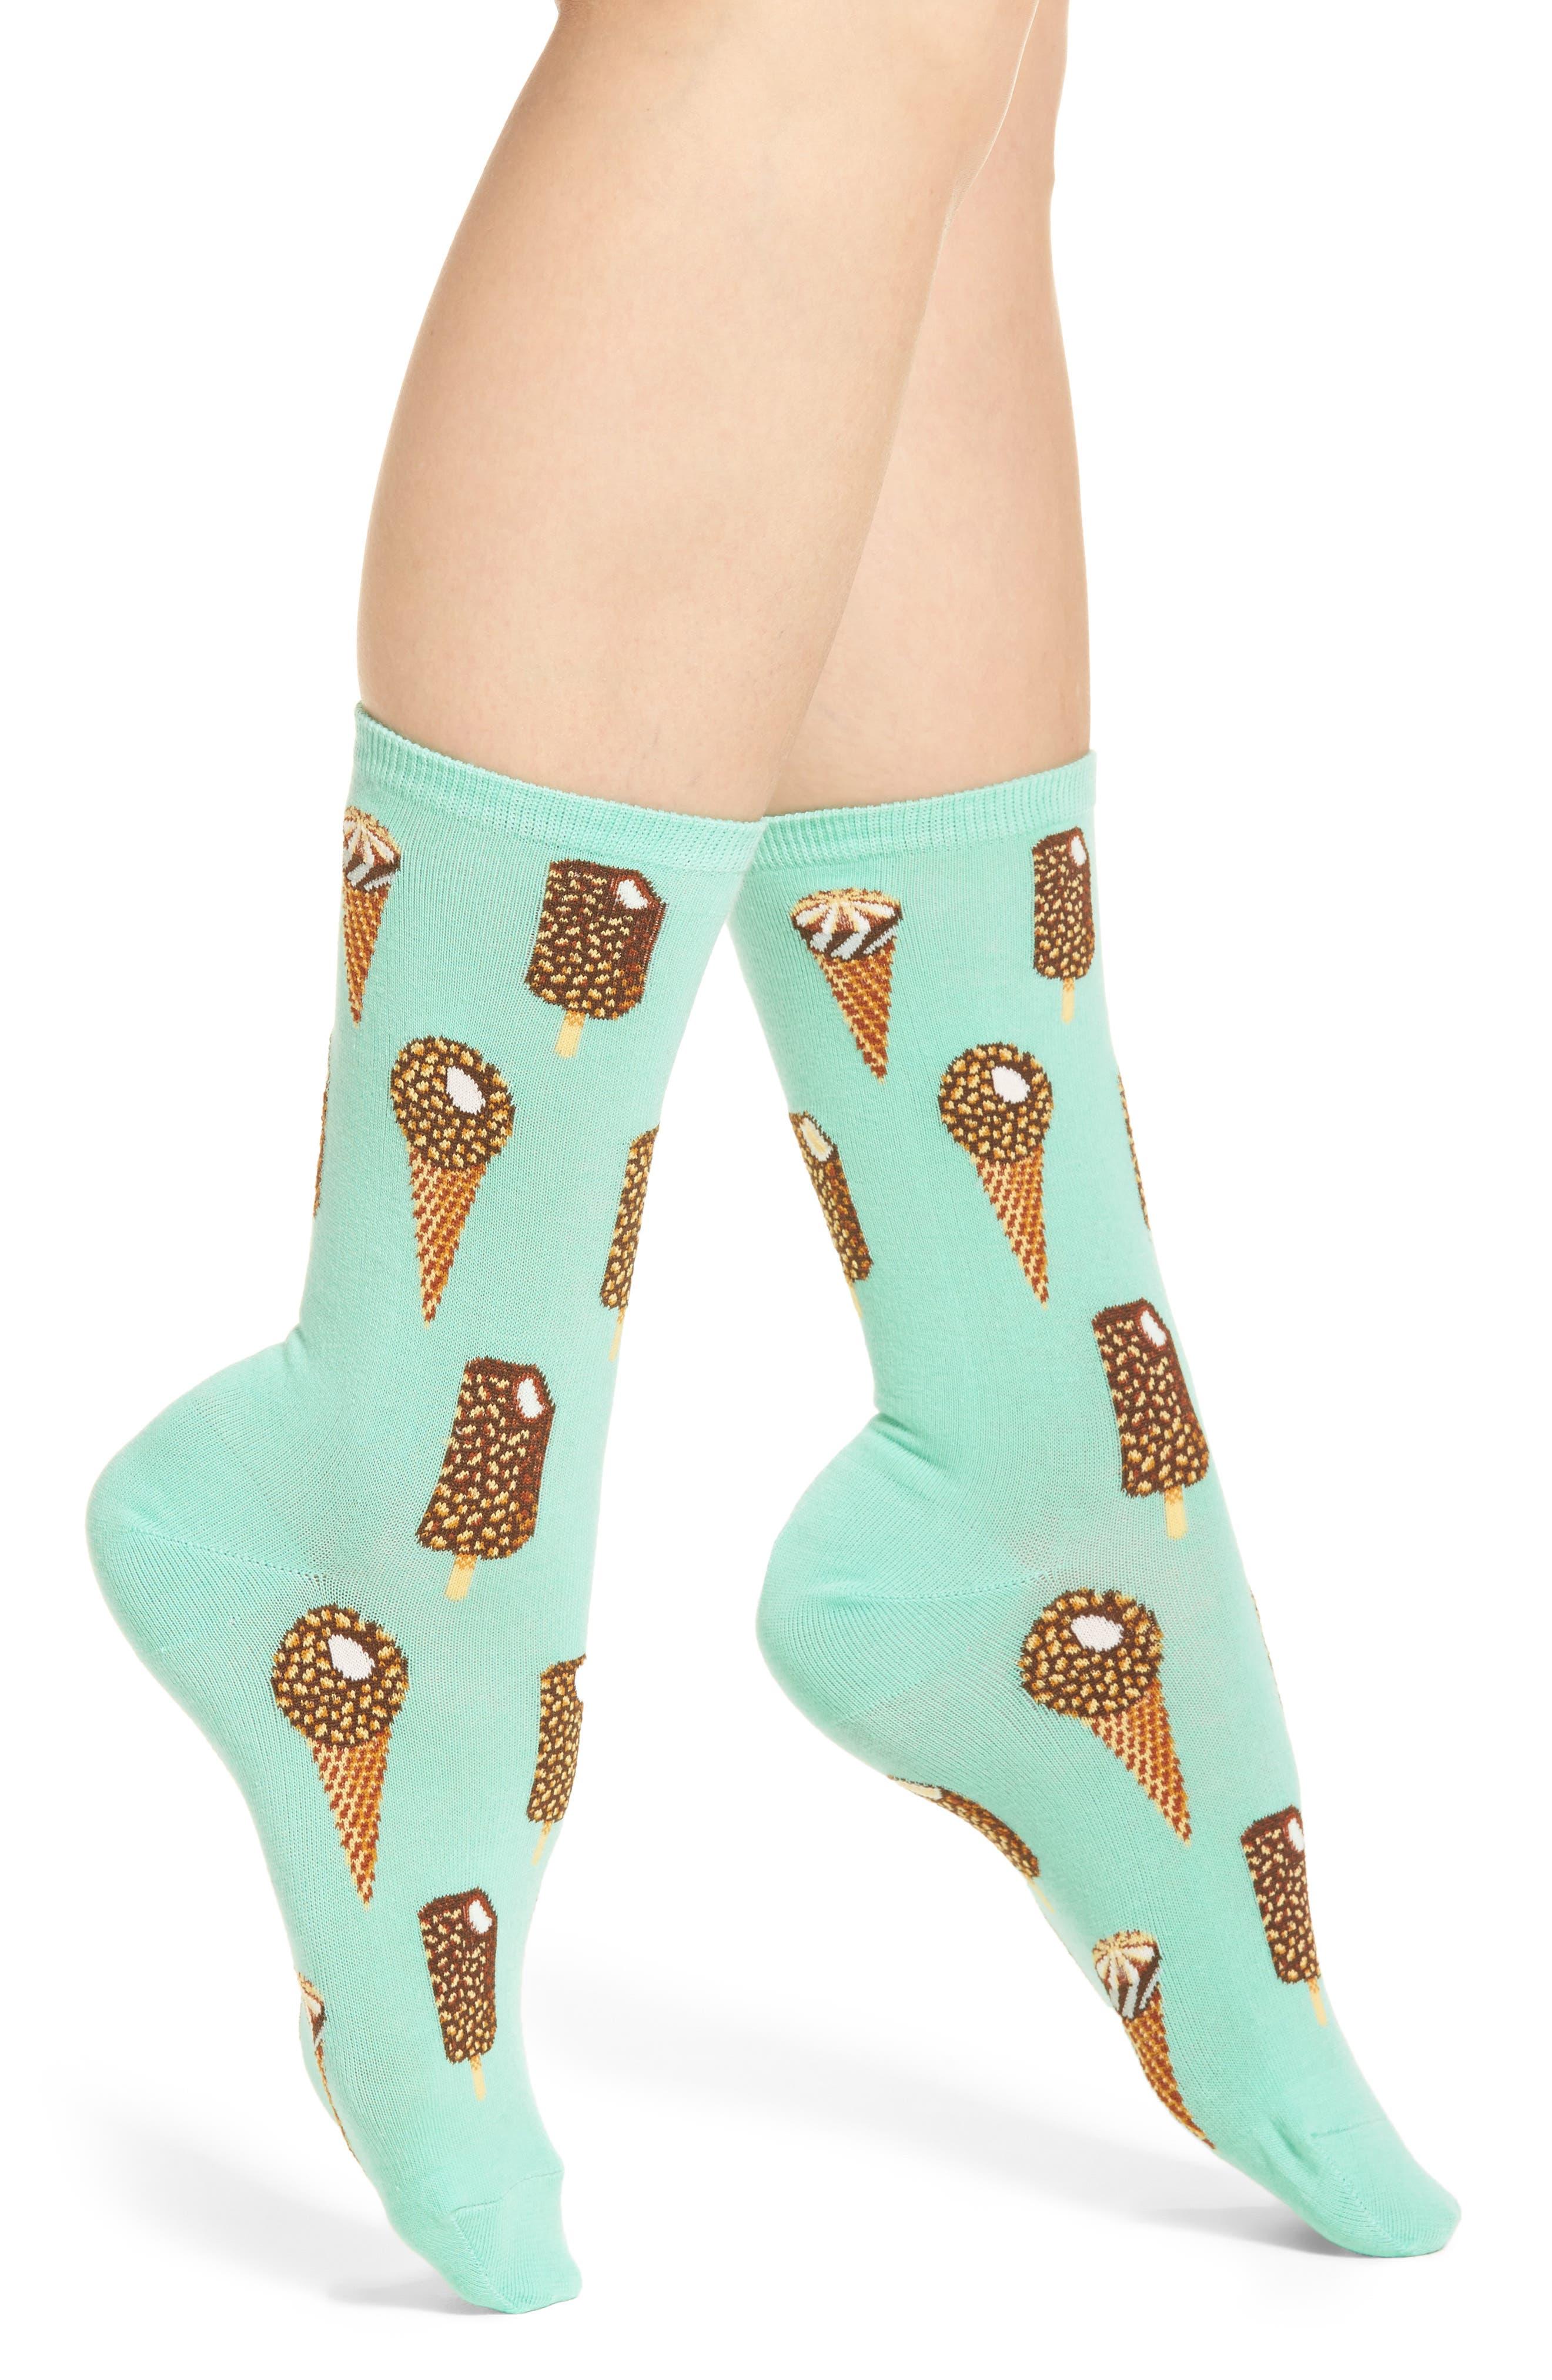 Ice Cream Crew Socks,                             Main thumbnail 1, color,                             Jade